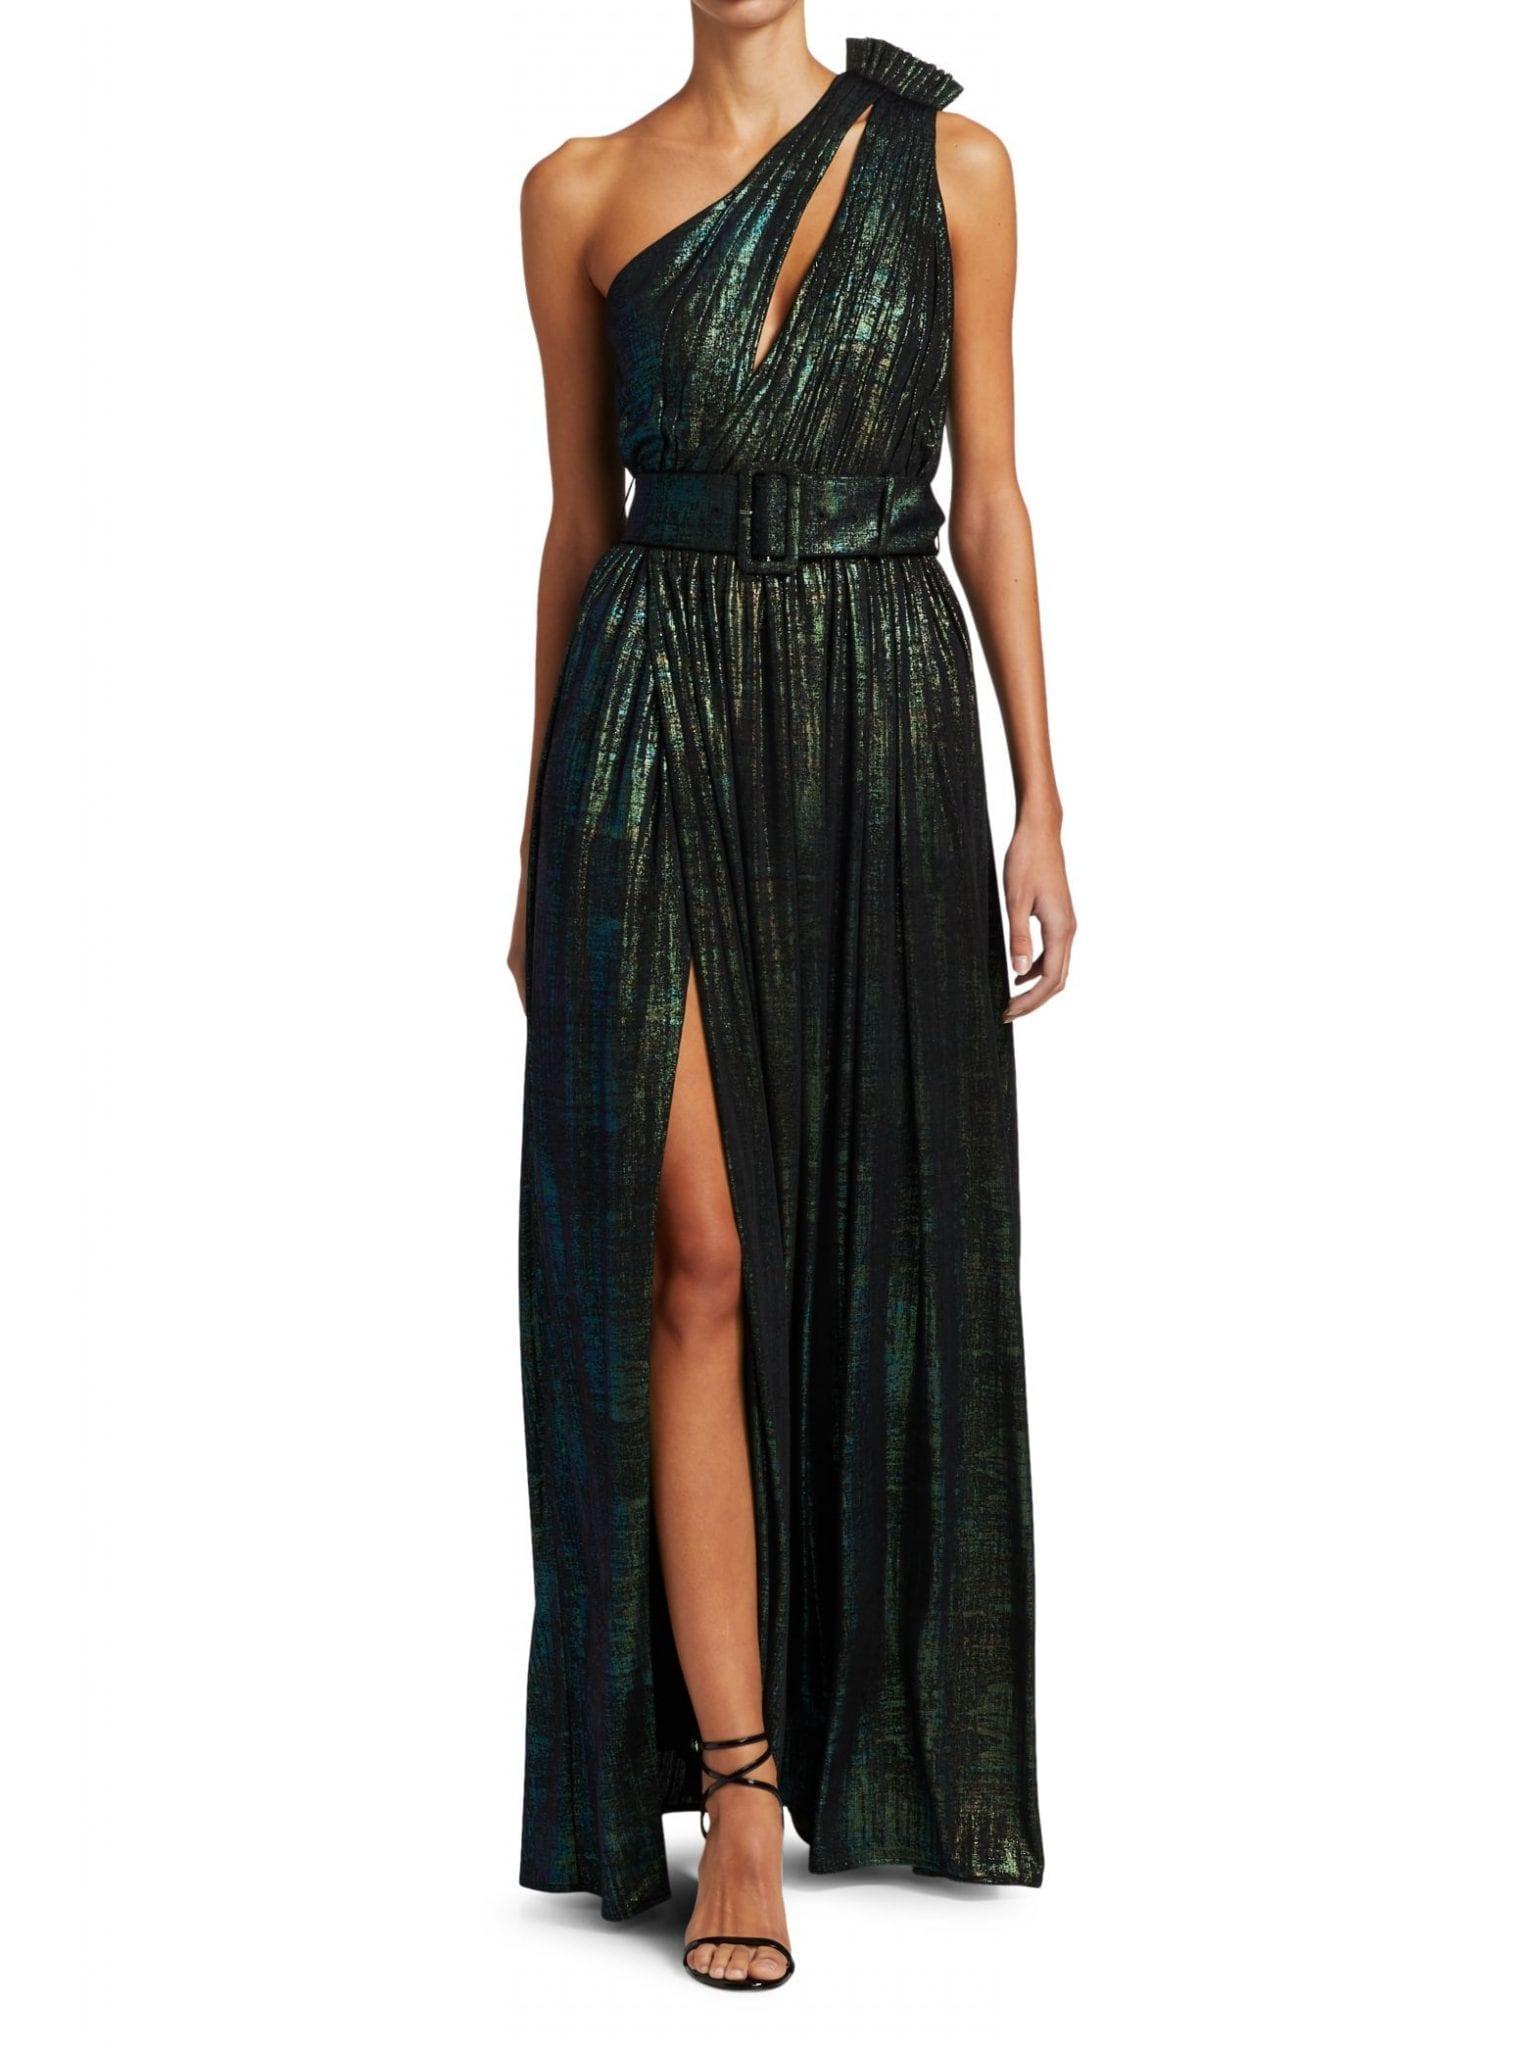 RETROFÊTE Andrea One-Shoulder Metallic Pleated Column Dress